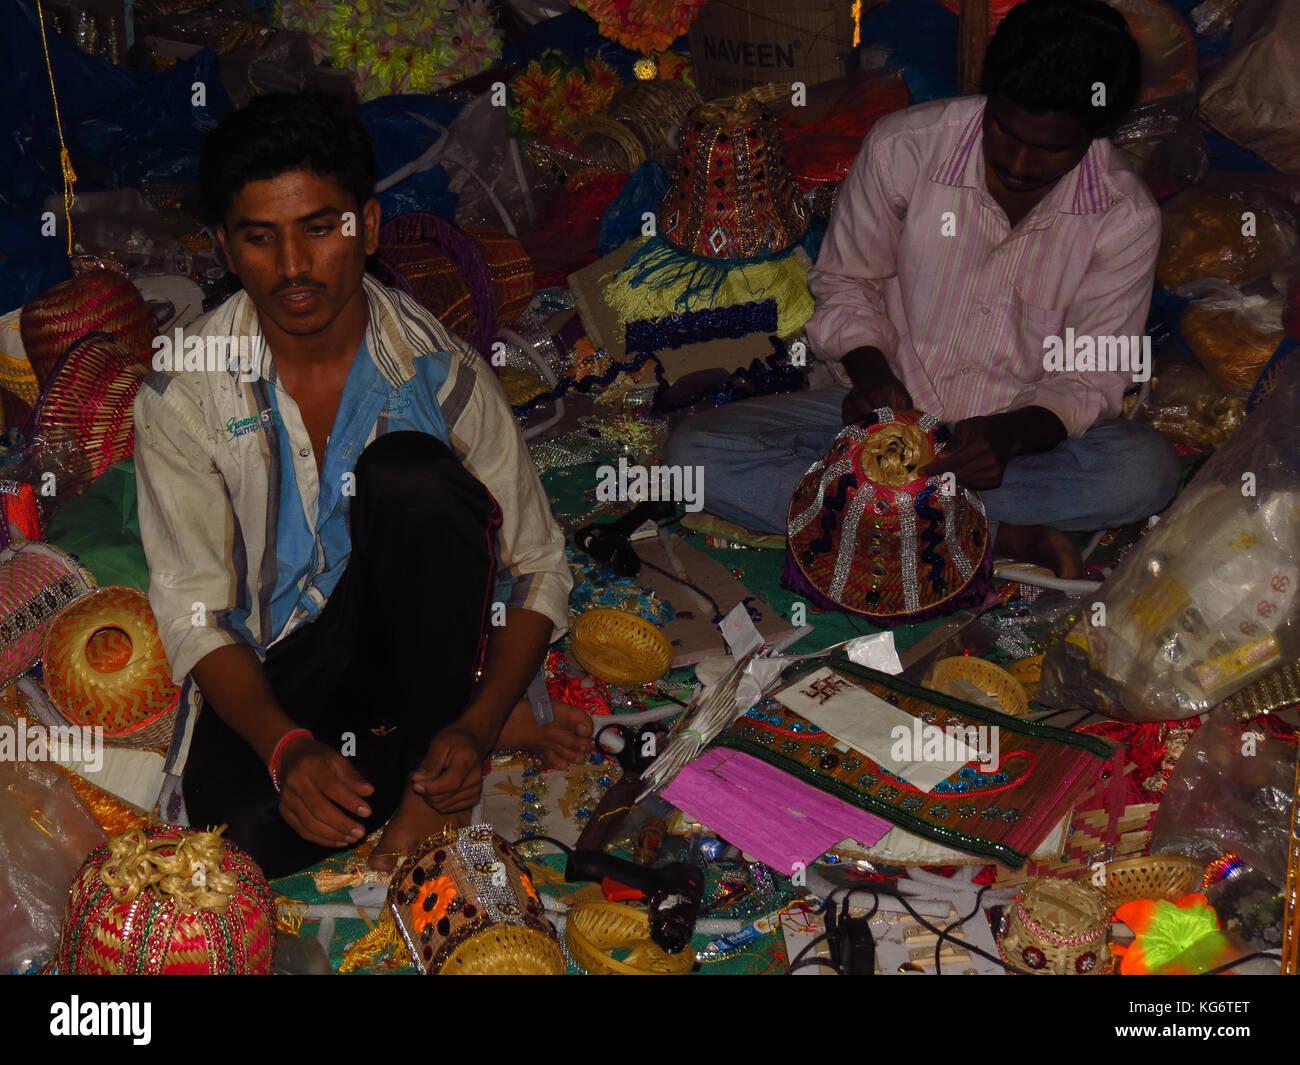 Indian craftsmen make traditional Diwali lanterns in their factory in India. - Stock Image